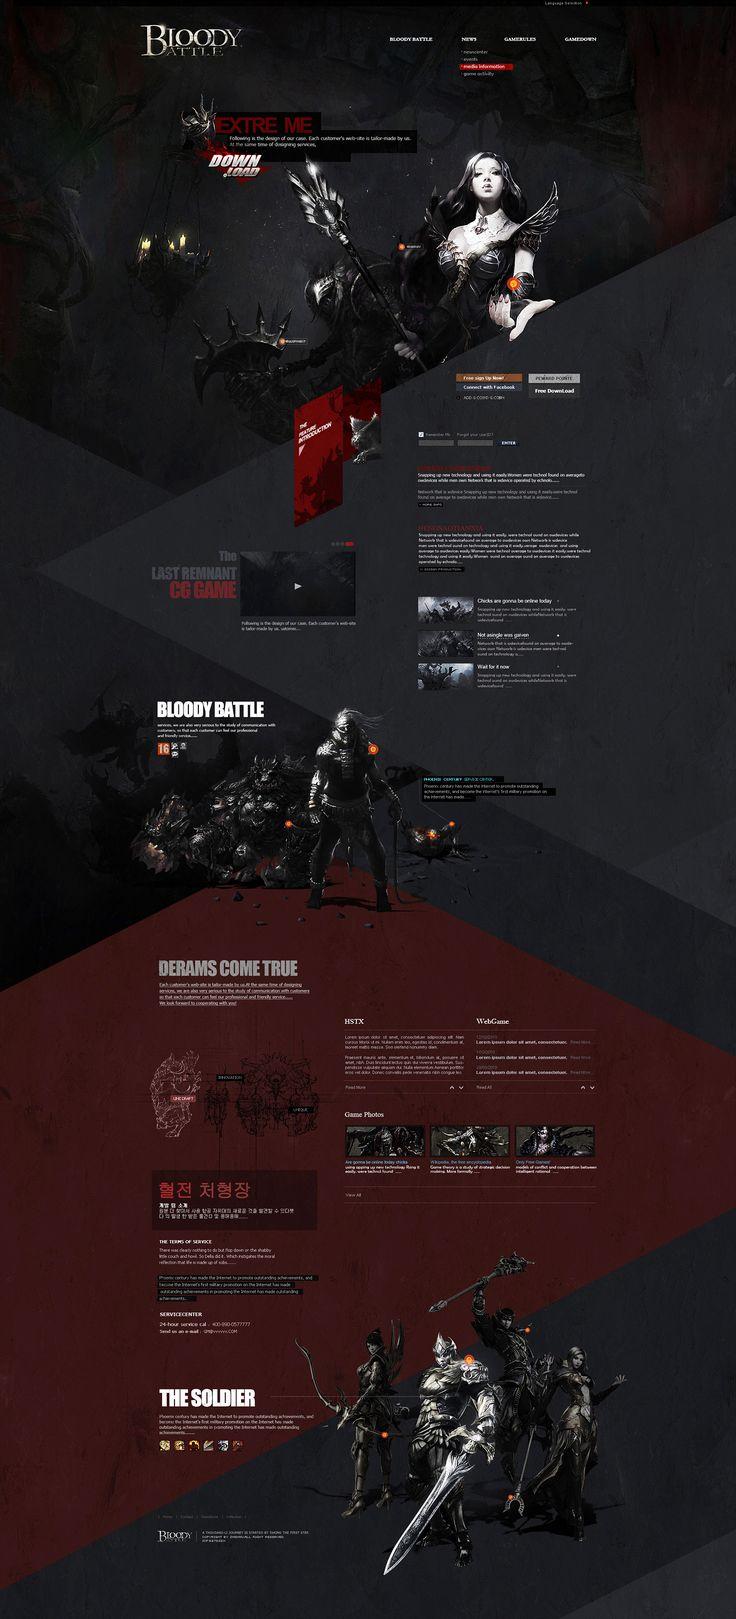 BLOODYBATTLE 设计与分享 网页 游戏/娱乐 igame丶 - 原创作品 - 站酷 (ZCOOL)